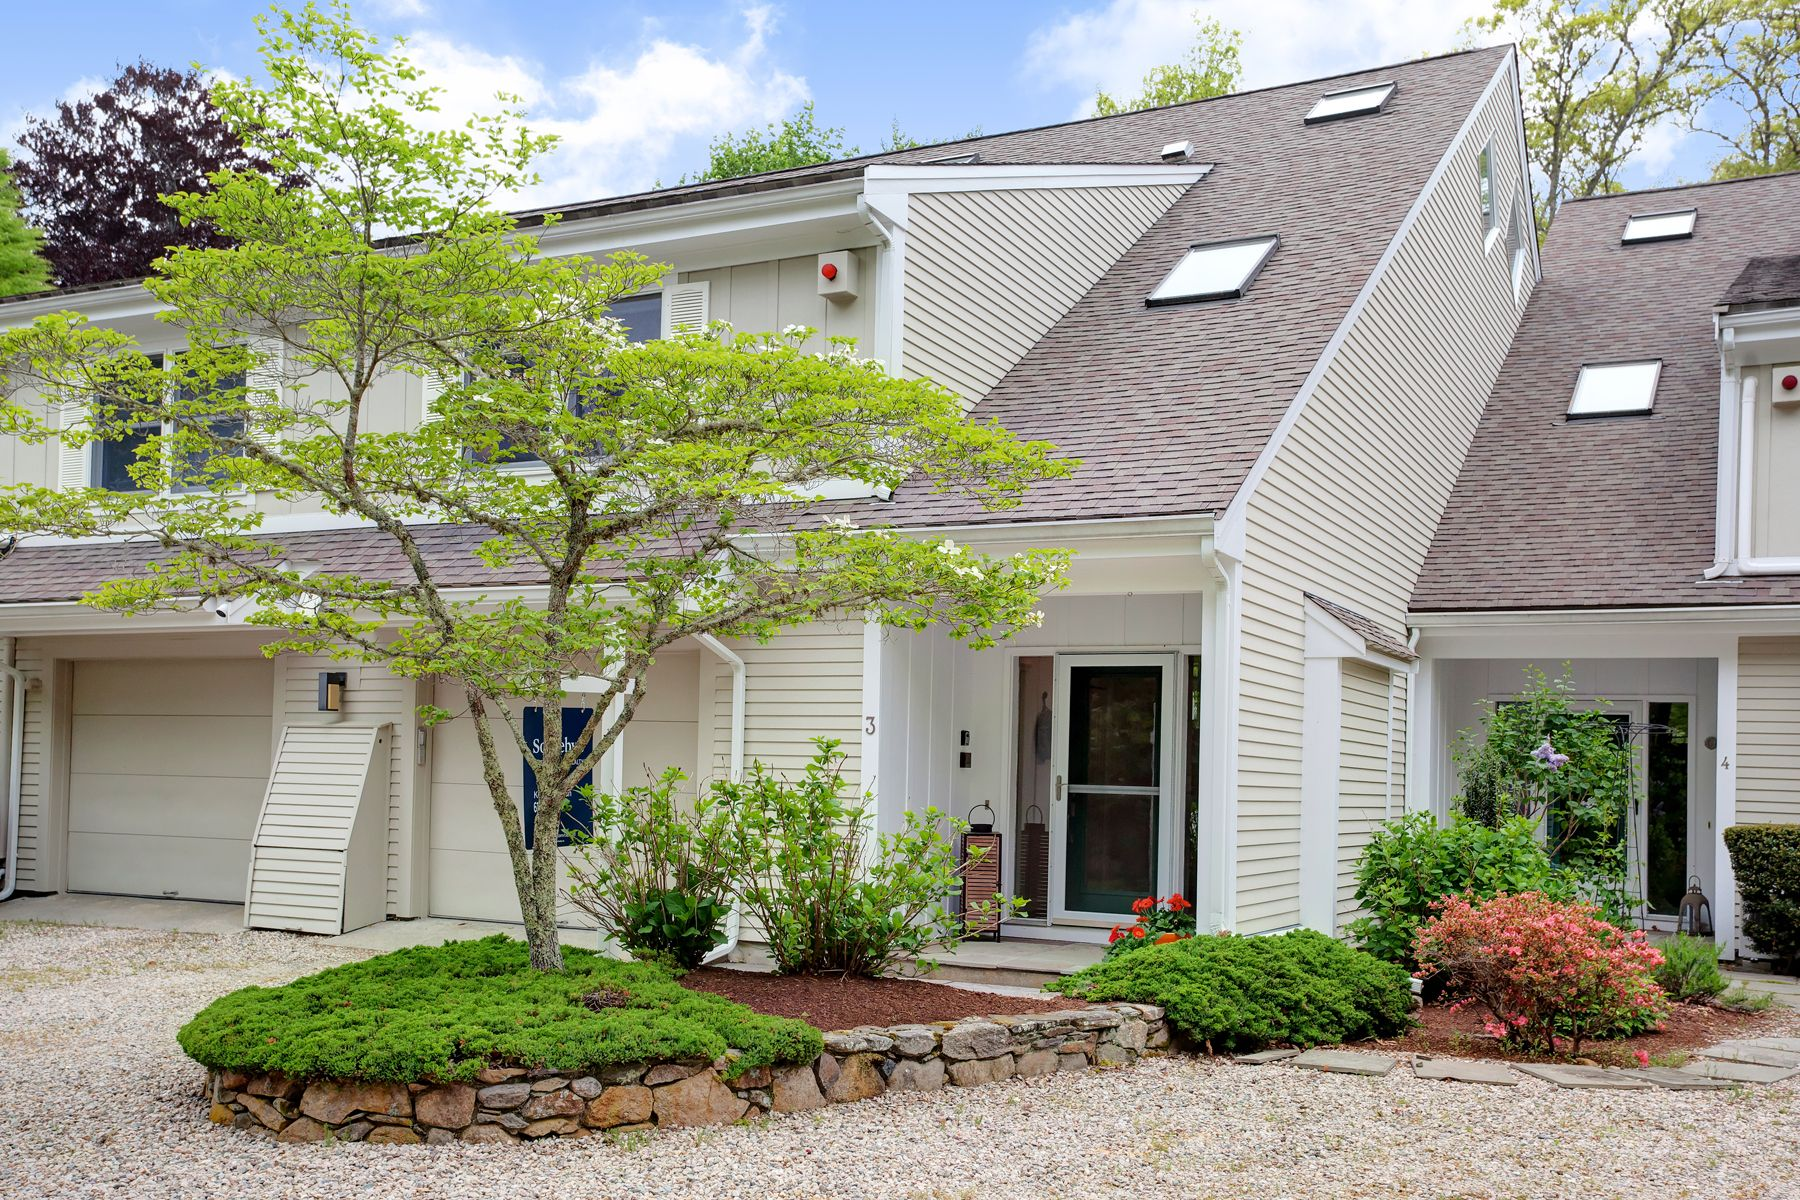 Condominiums 为 销售 在 45 Highfield Drive, Unit 3 法尔茅斯, 马萨诸塞州 02540 美国